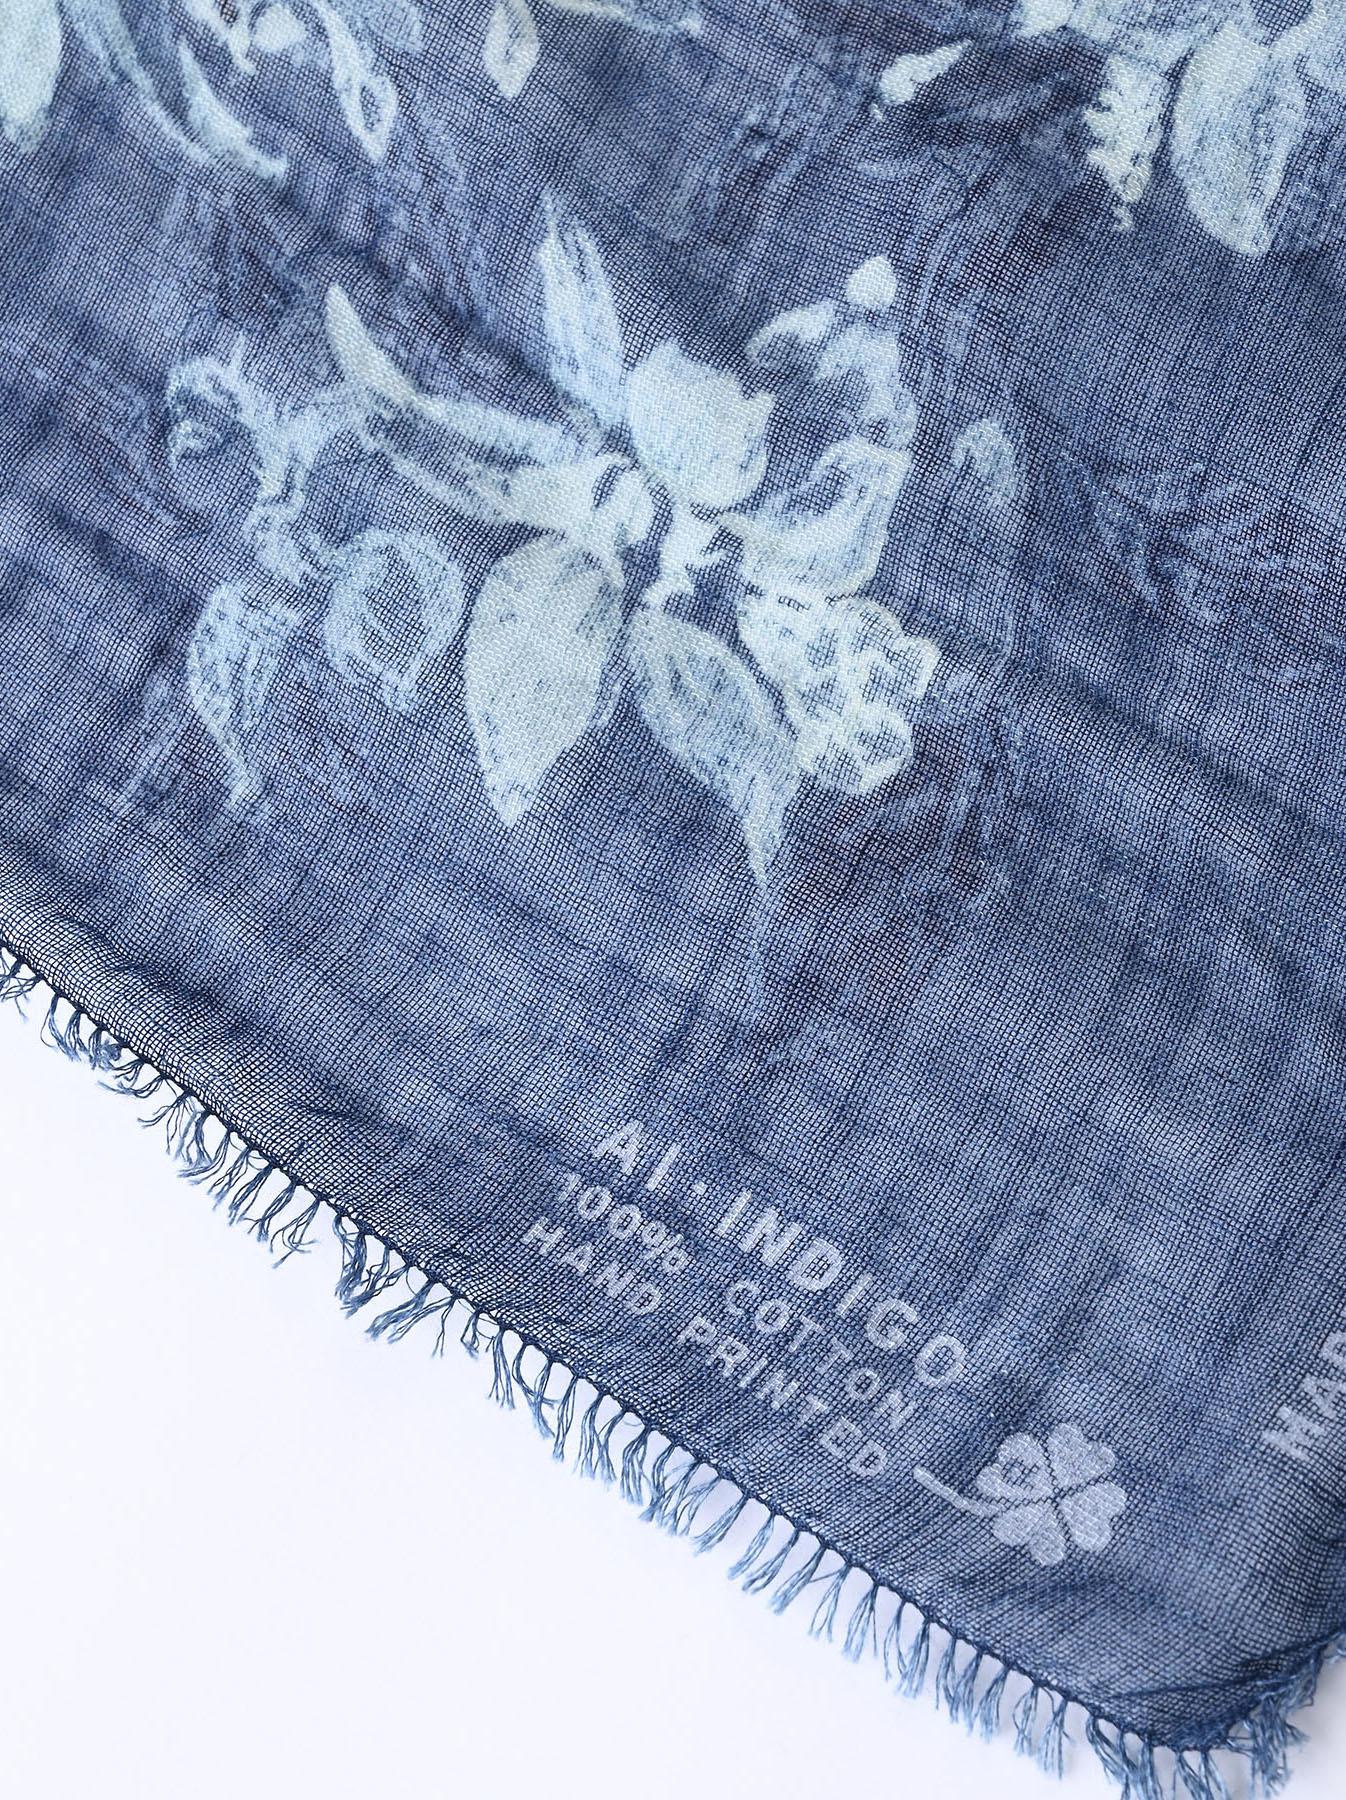 Indigo Gauze Flower Wreath Furoshikii (0621)-7